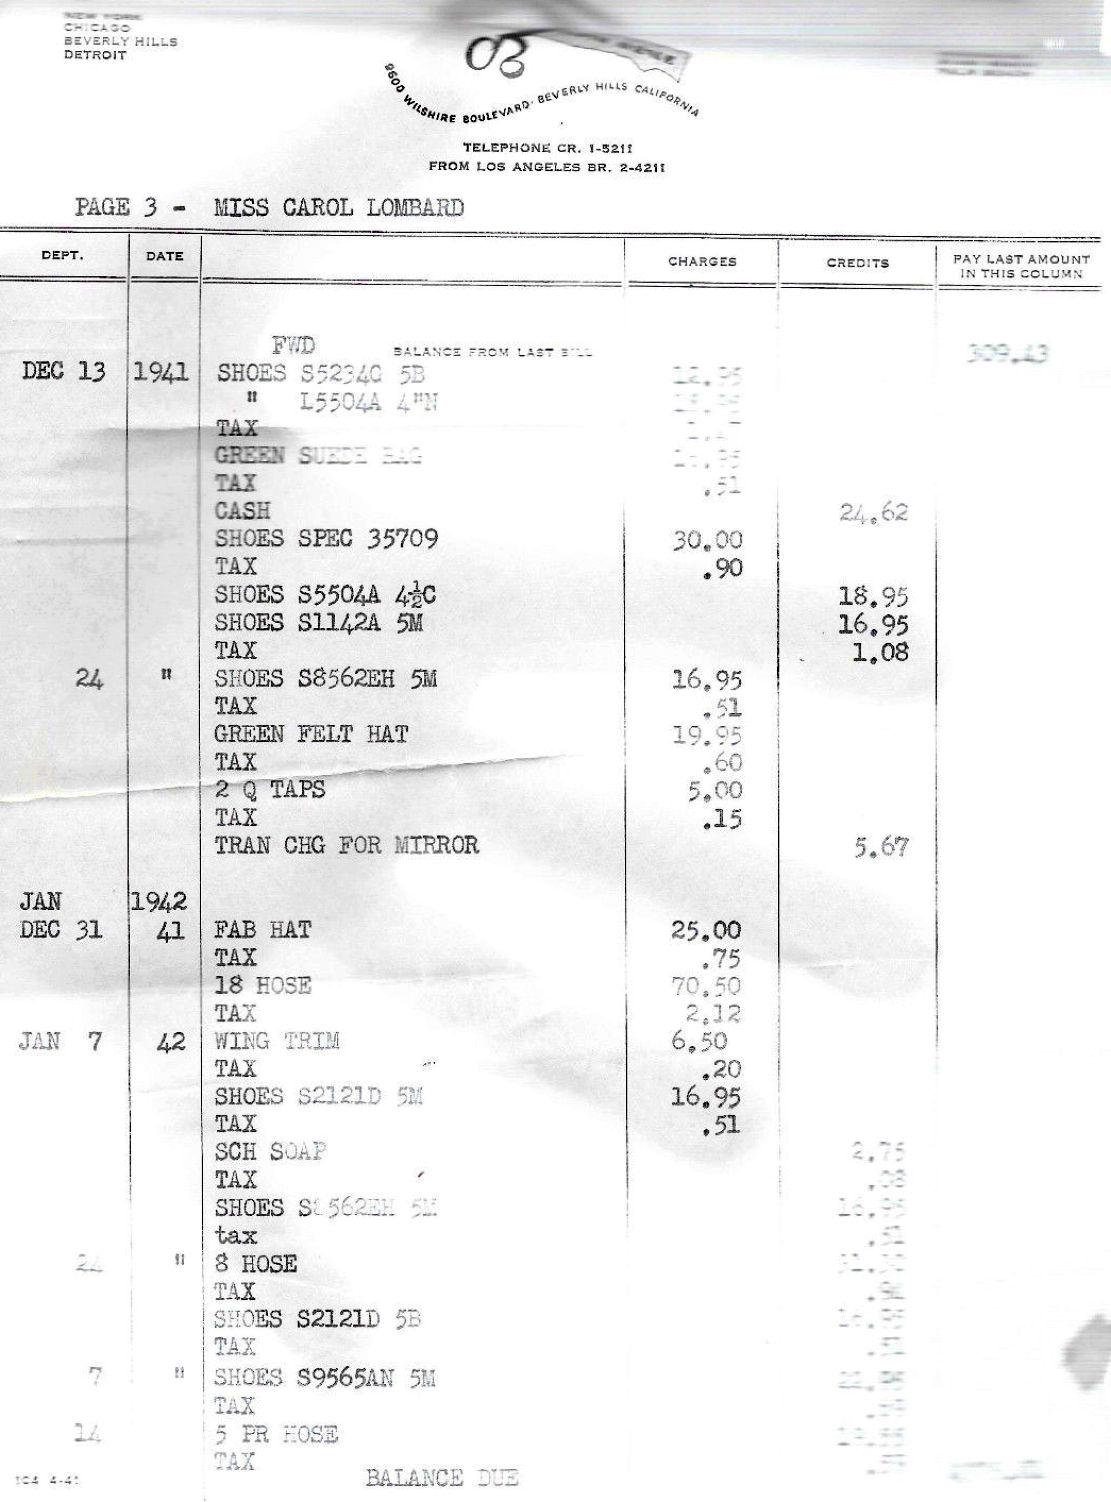 carole lombard clark gable 071542 saks estate 07a